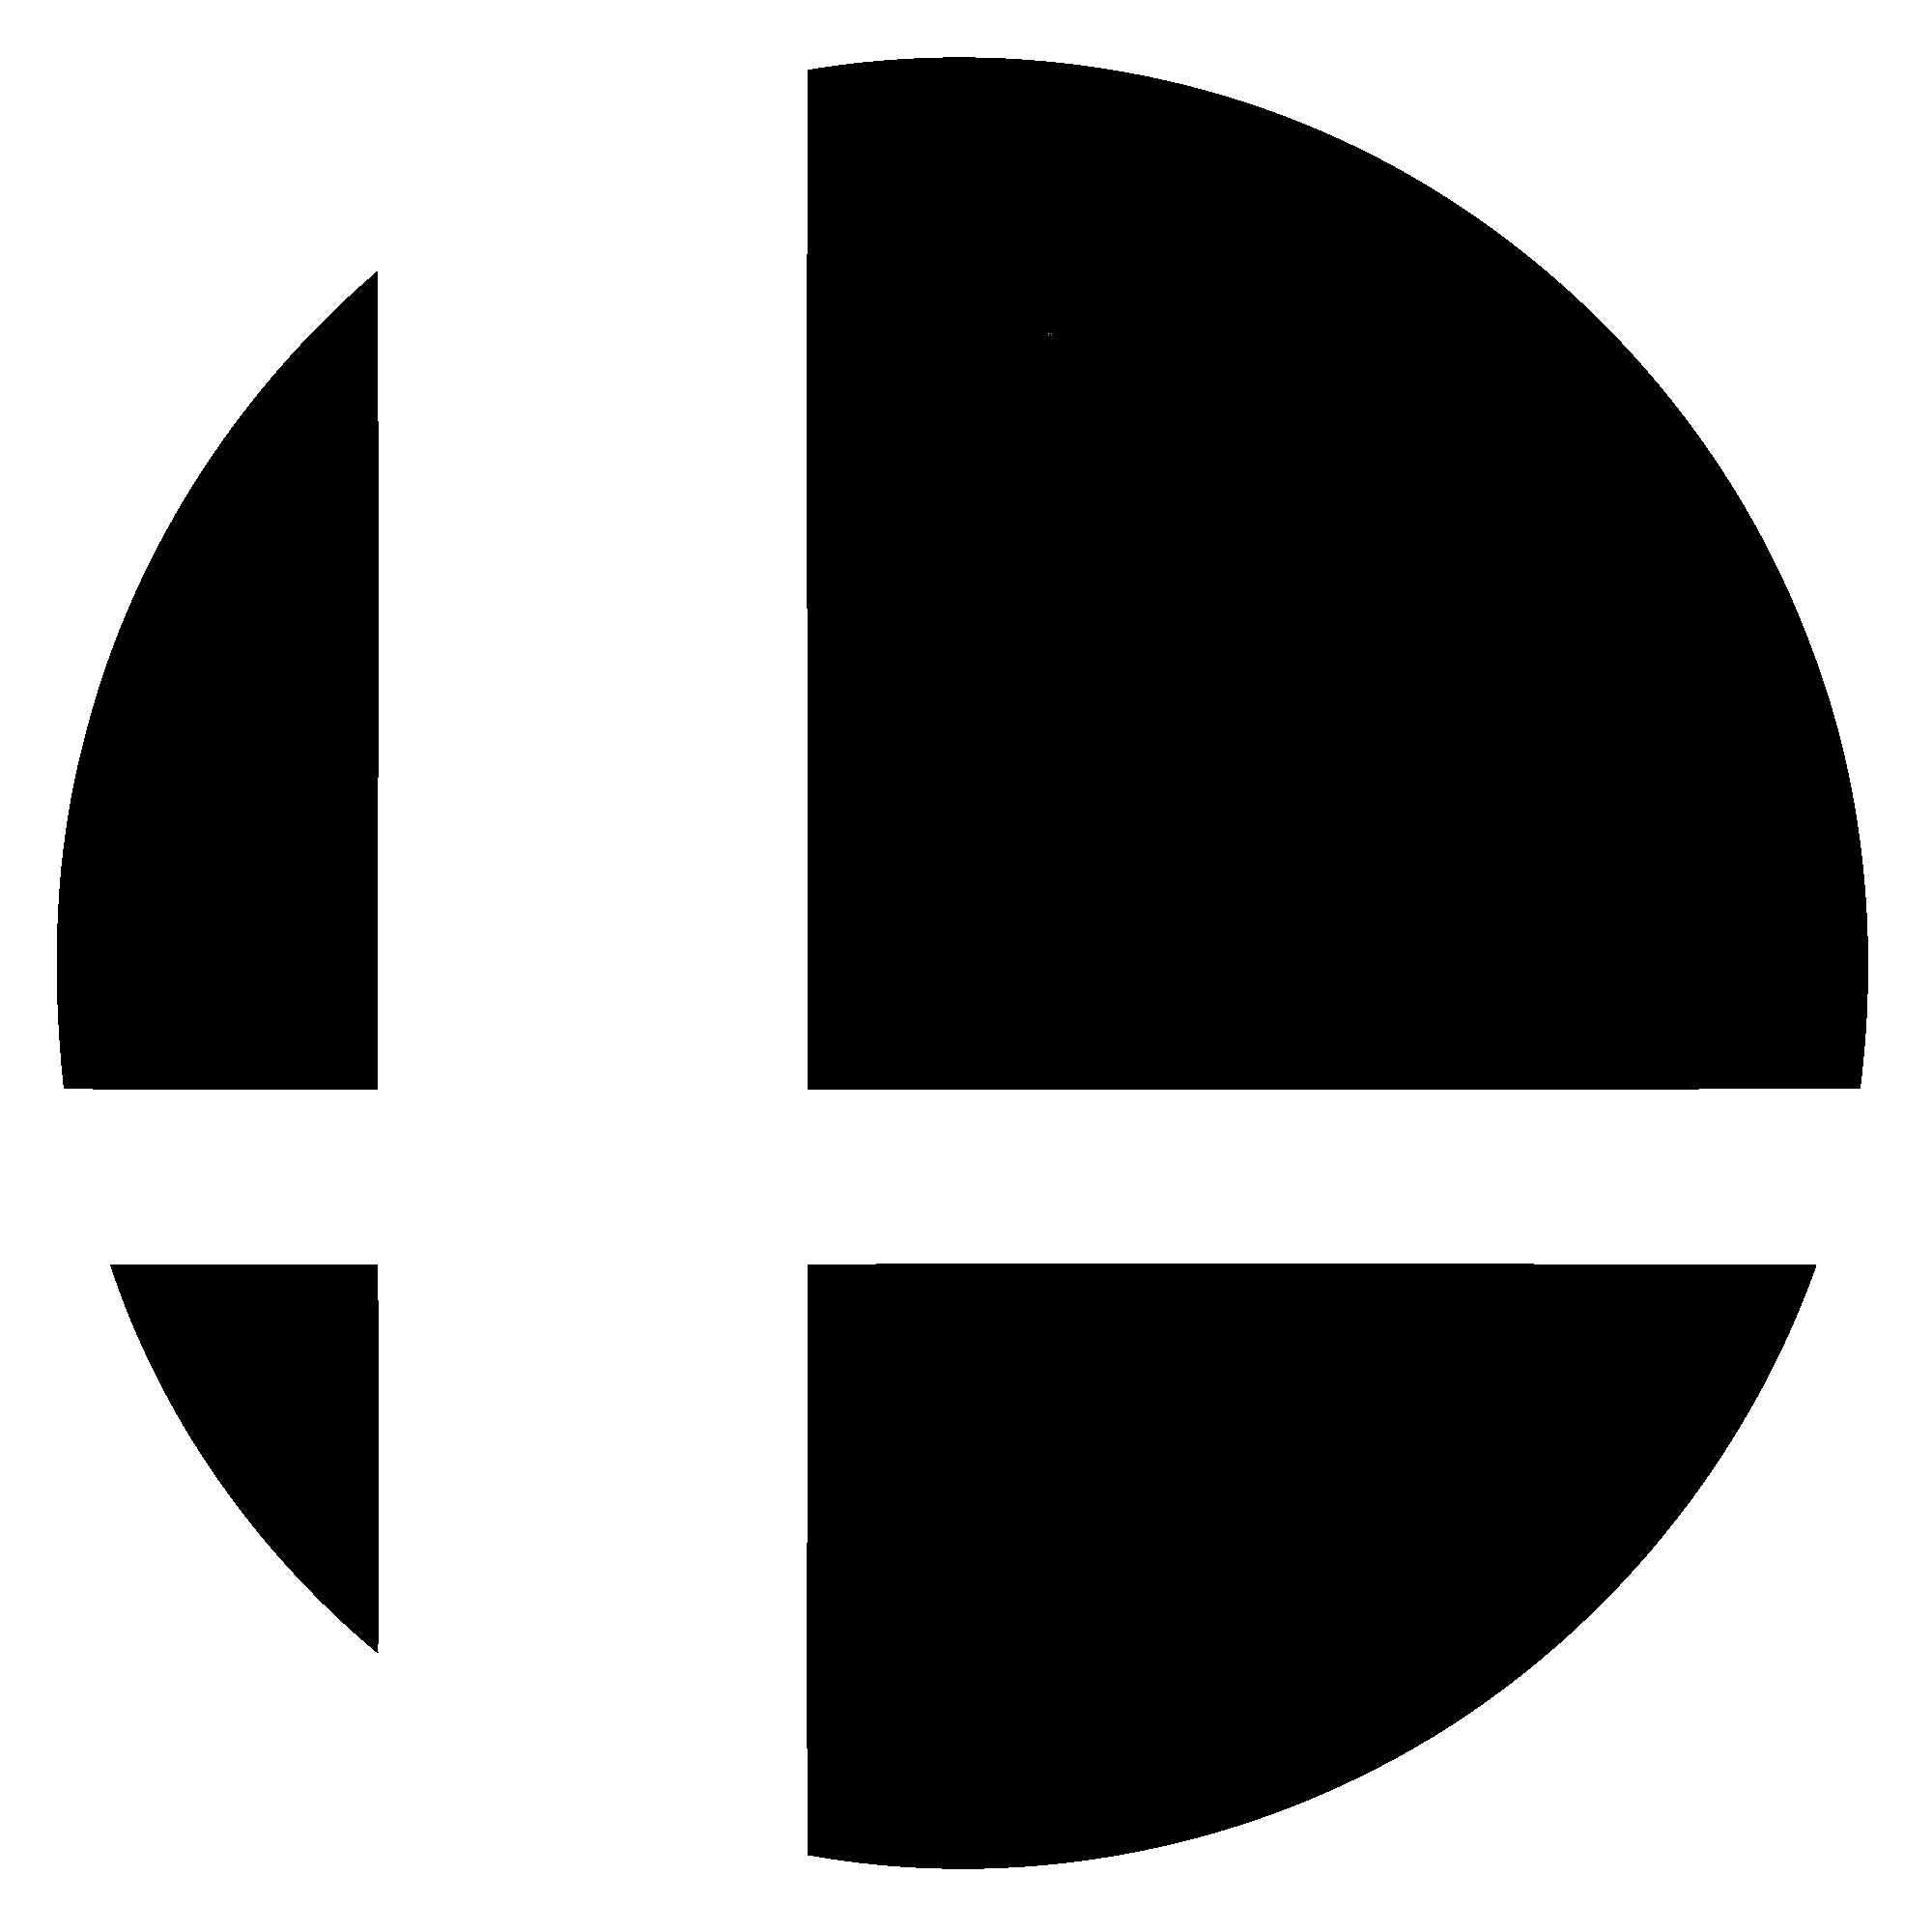 Blanco8x8